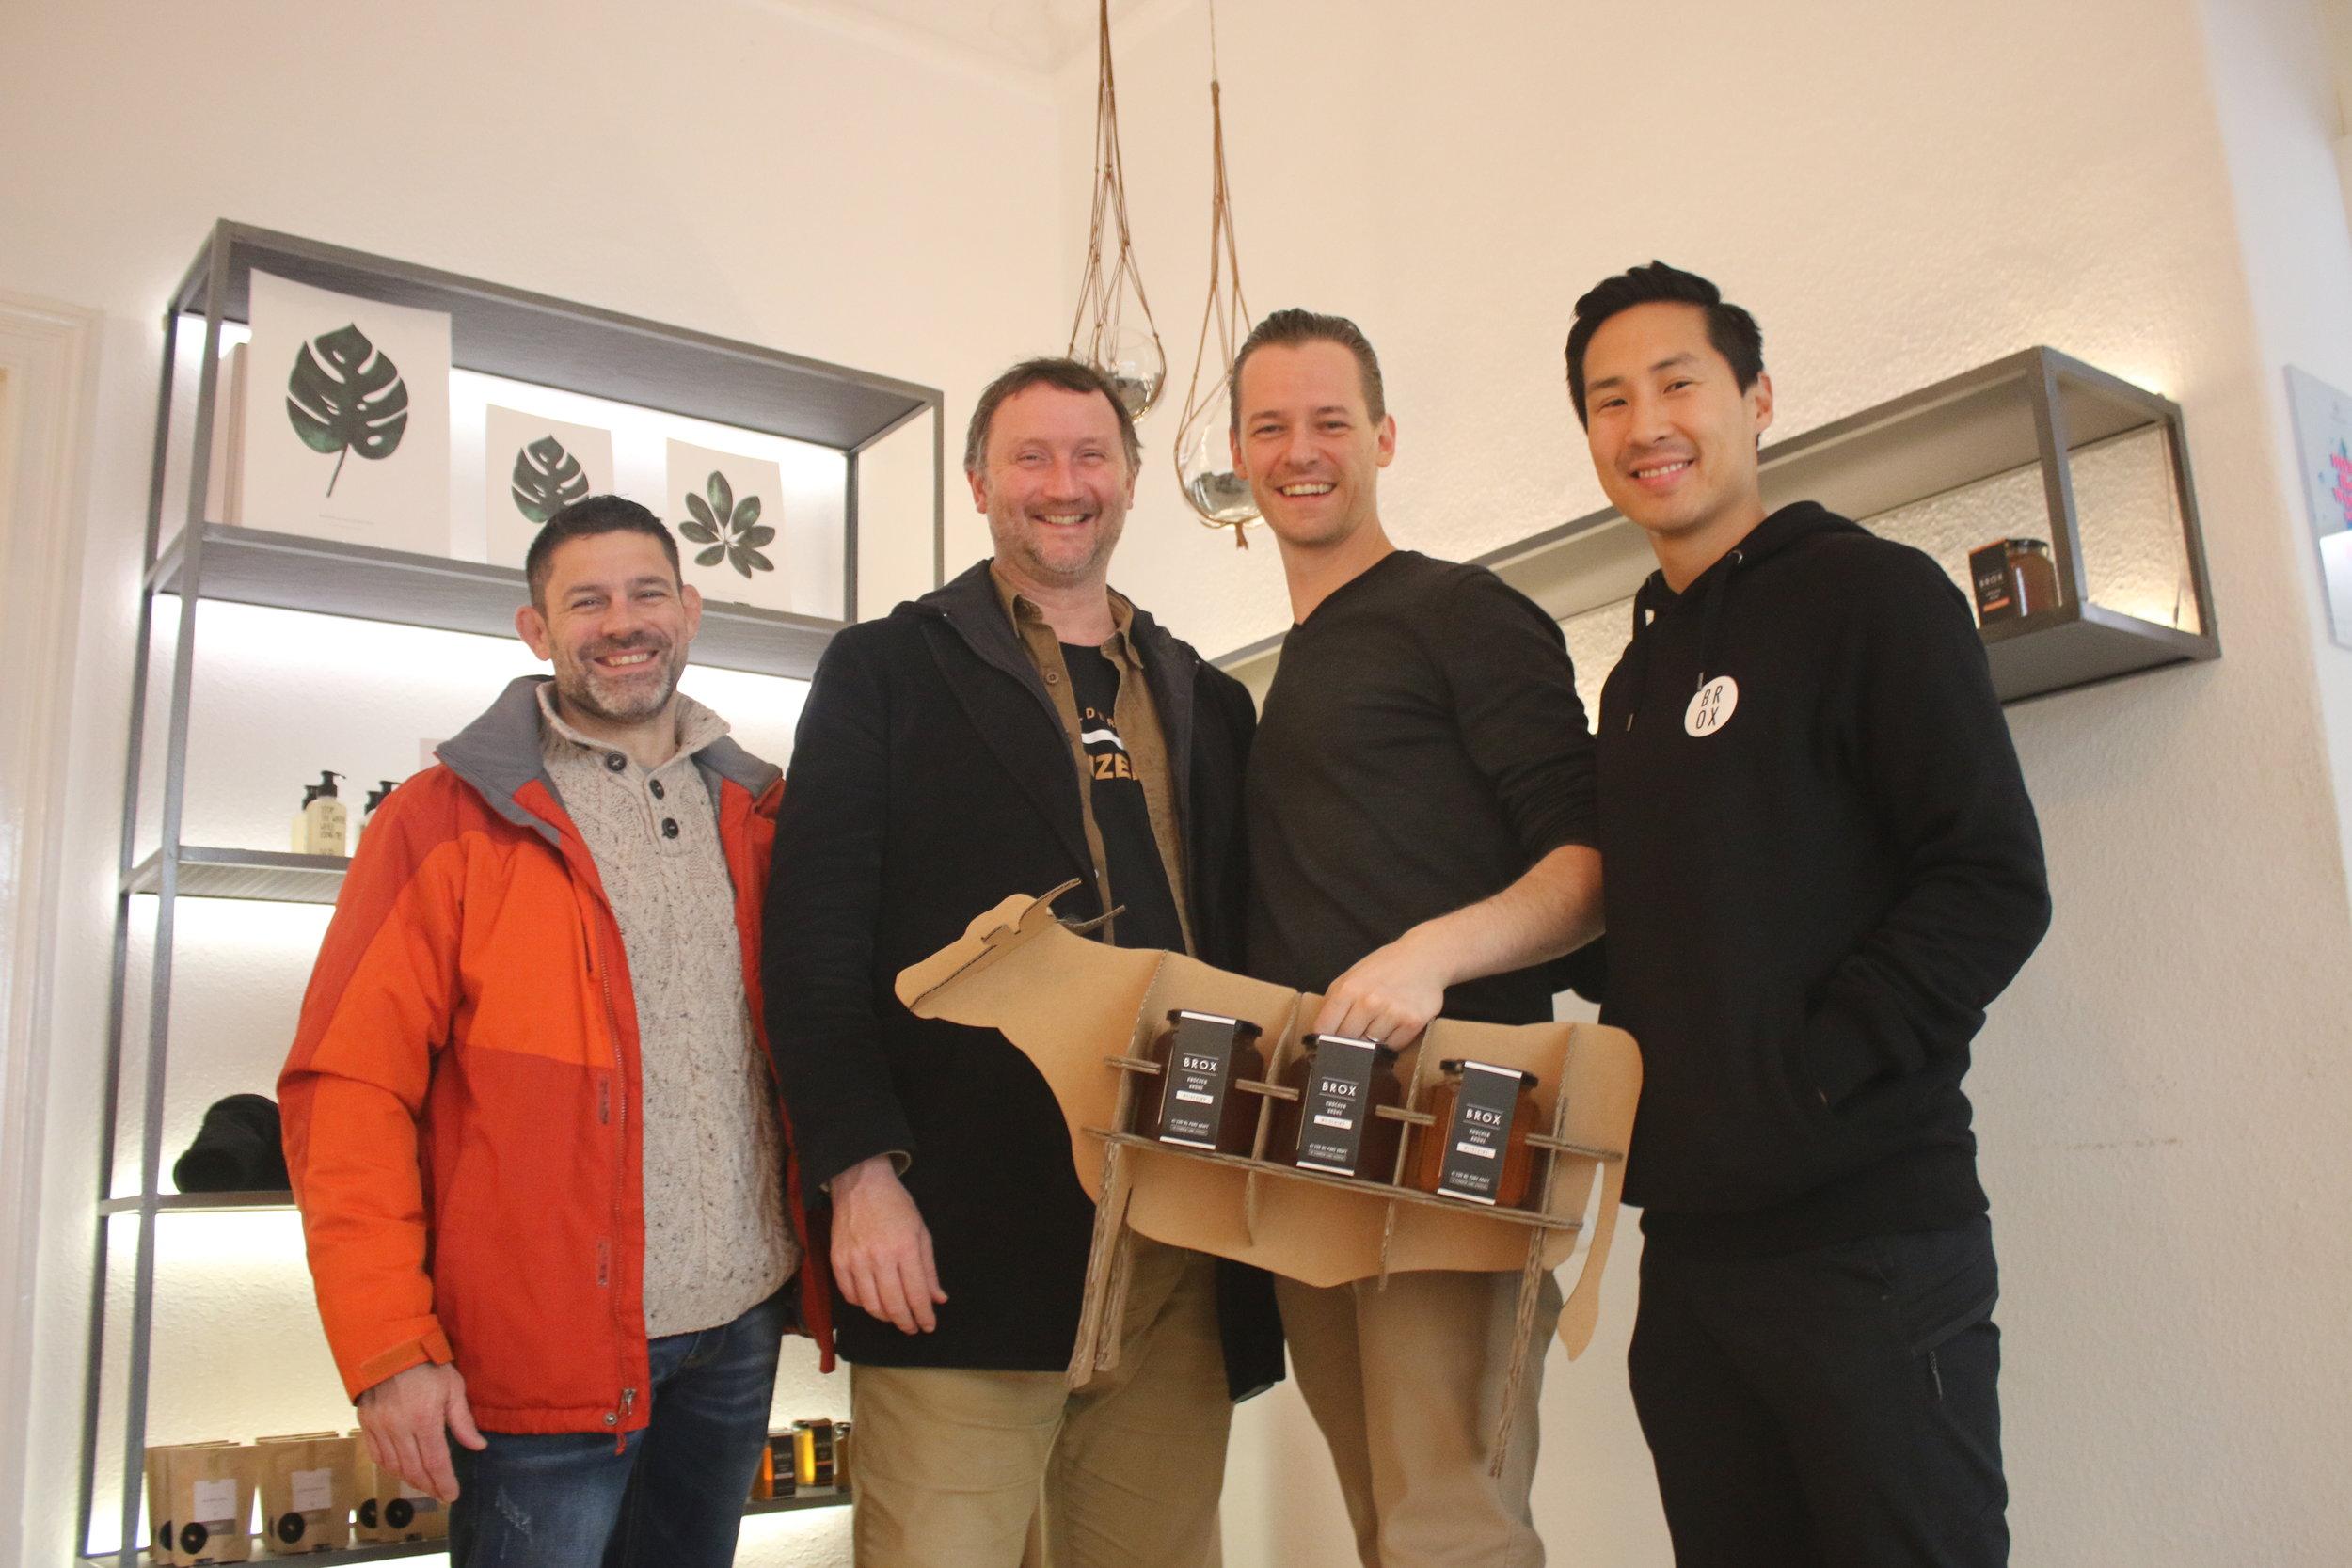 Bill, Jason, Konrad and his business partner